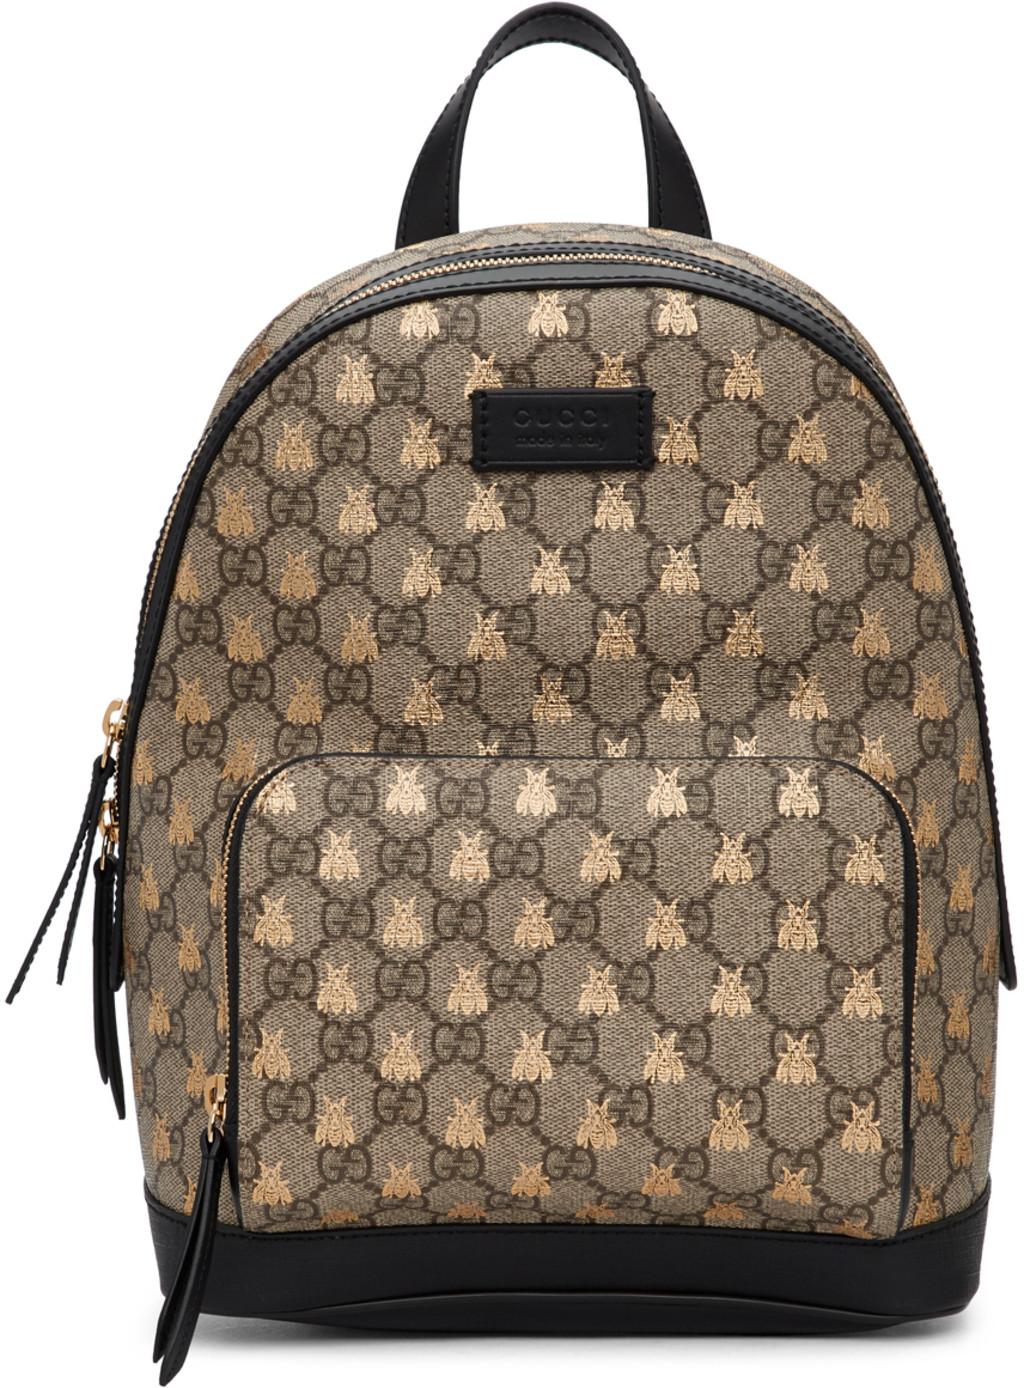 f2f1d5e521899 Gucci Brown and Pink Medium GG Supreme Dionysus Bag Guccihandbags